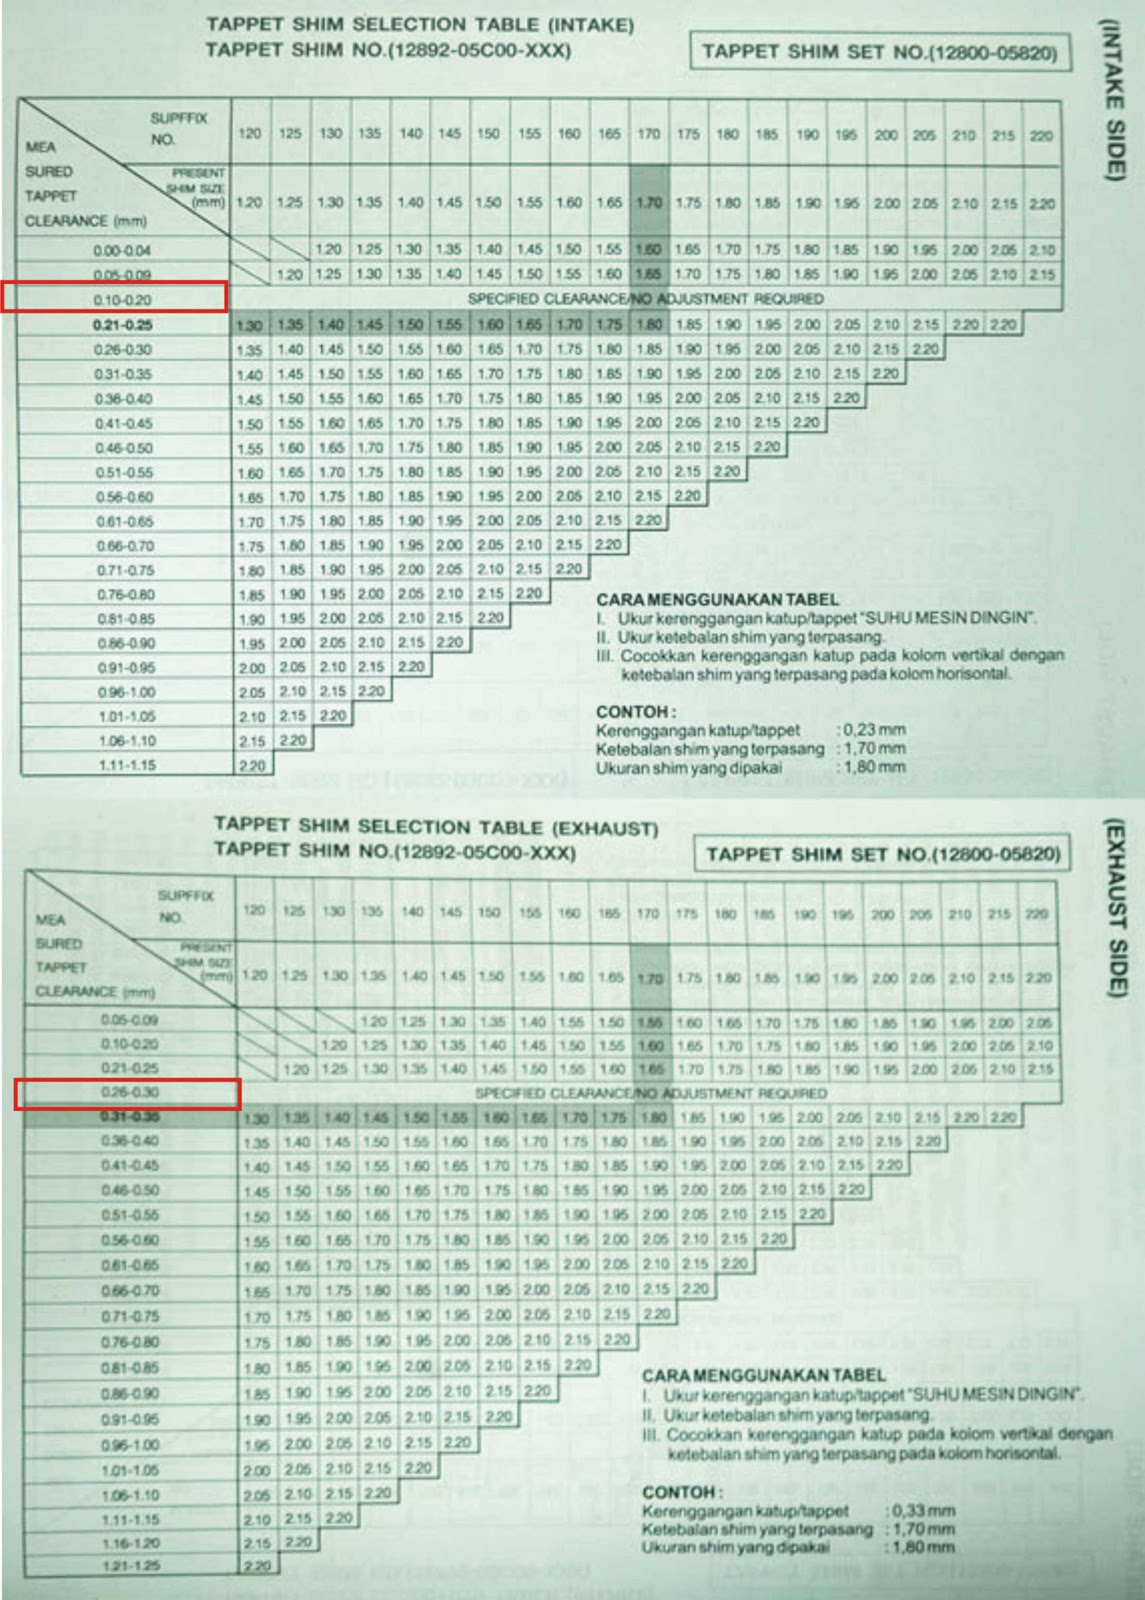 info manual suzuki raider shim table rh infolastmanual blogspot com suzuki raider 150 service manual suzuki raider fu 150 sc service manual